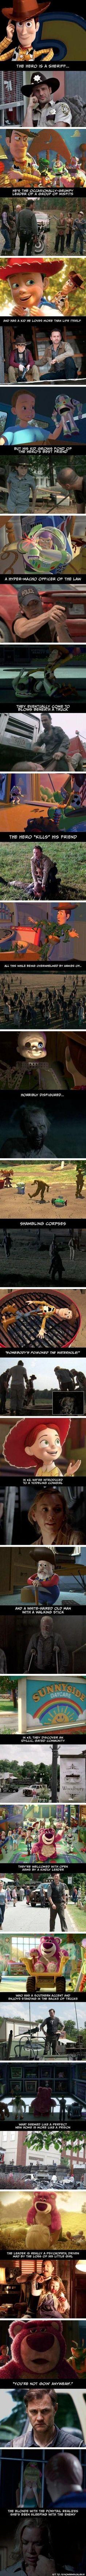 TWD and Toy Story, oh the similarities! @Kala Wangsness Wangsness hoke Vera: